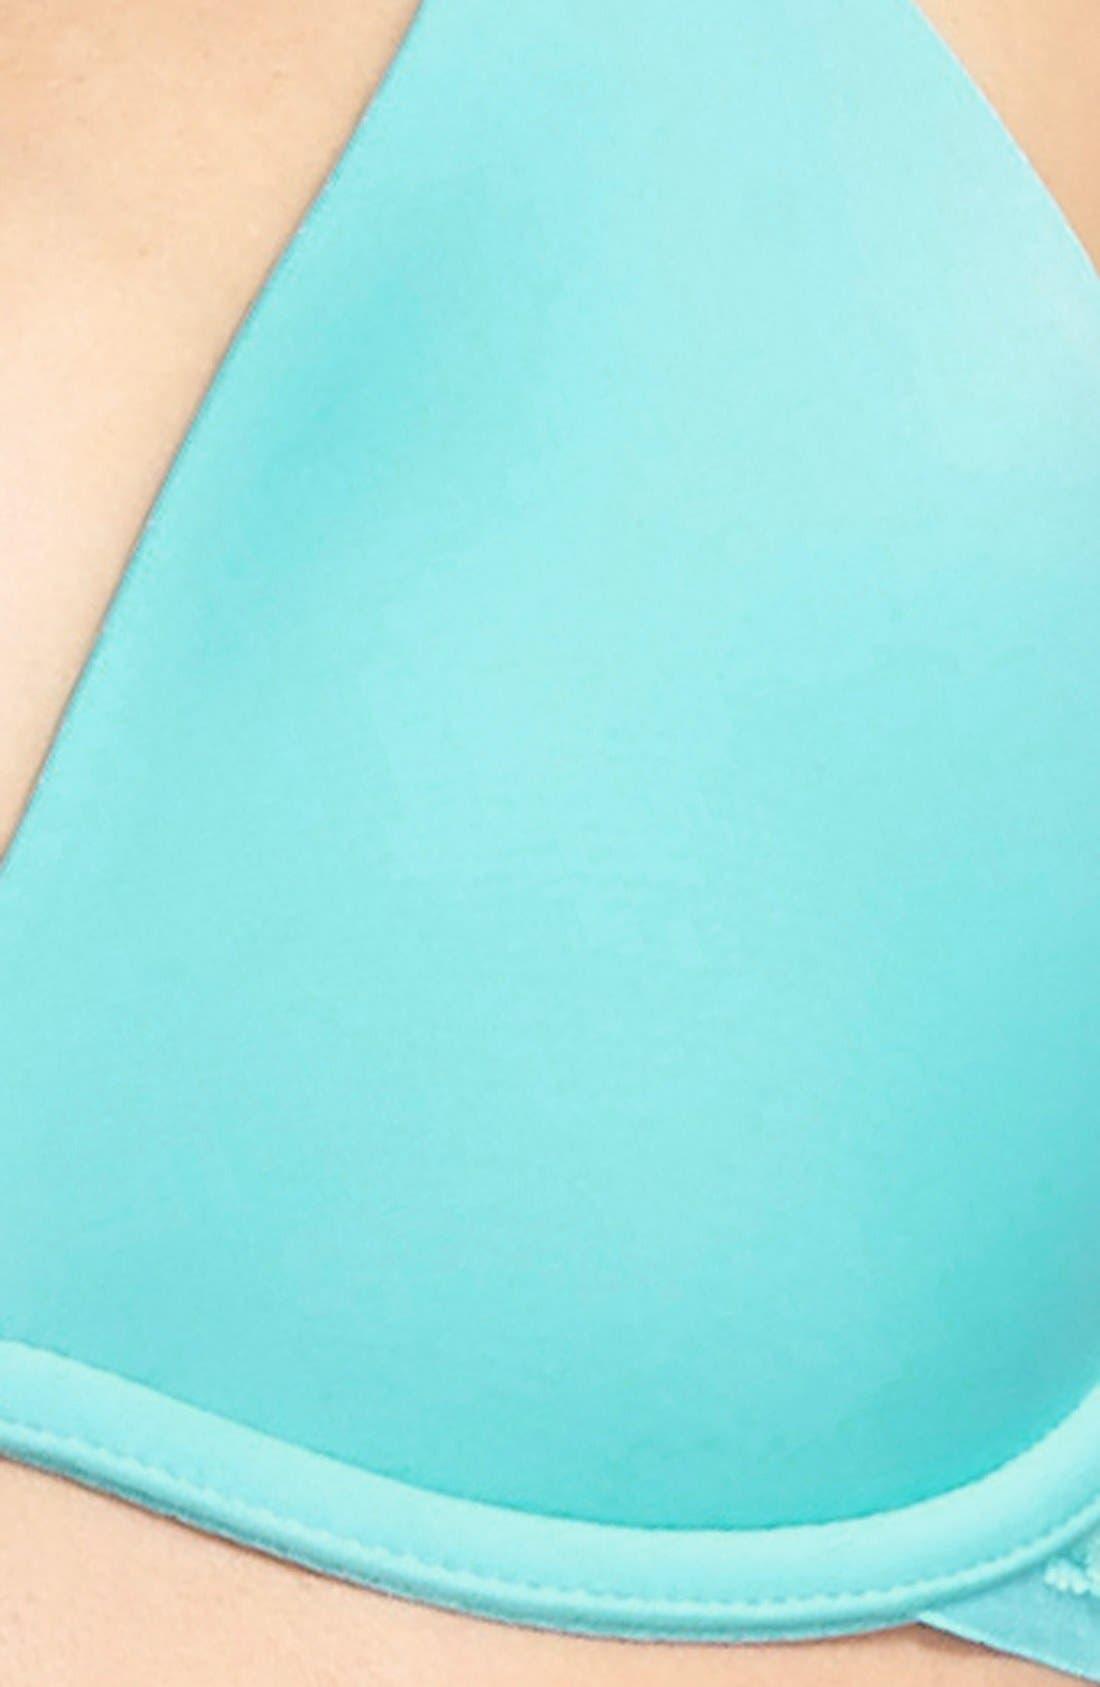 'Beautifully Basic' Lace Trim Underwire Plunge Bra,                             Alternate thumbnail 28, color,